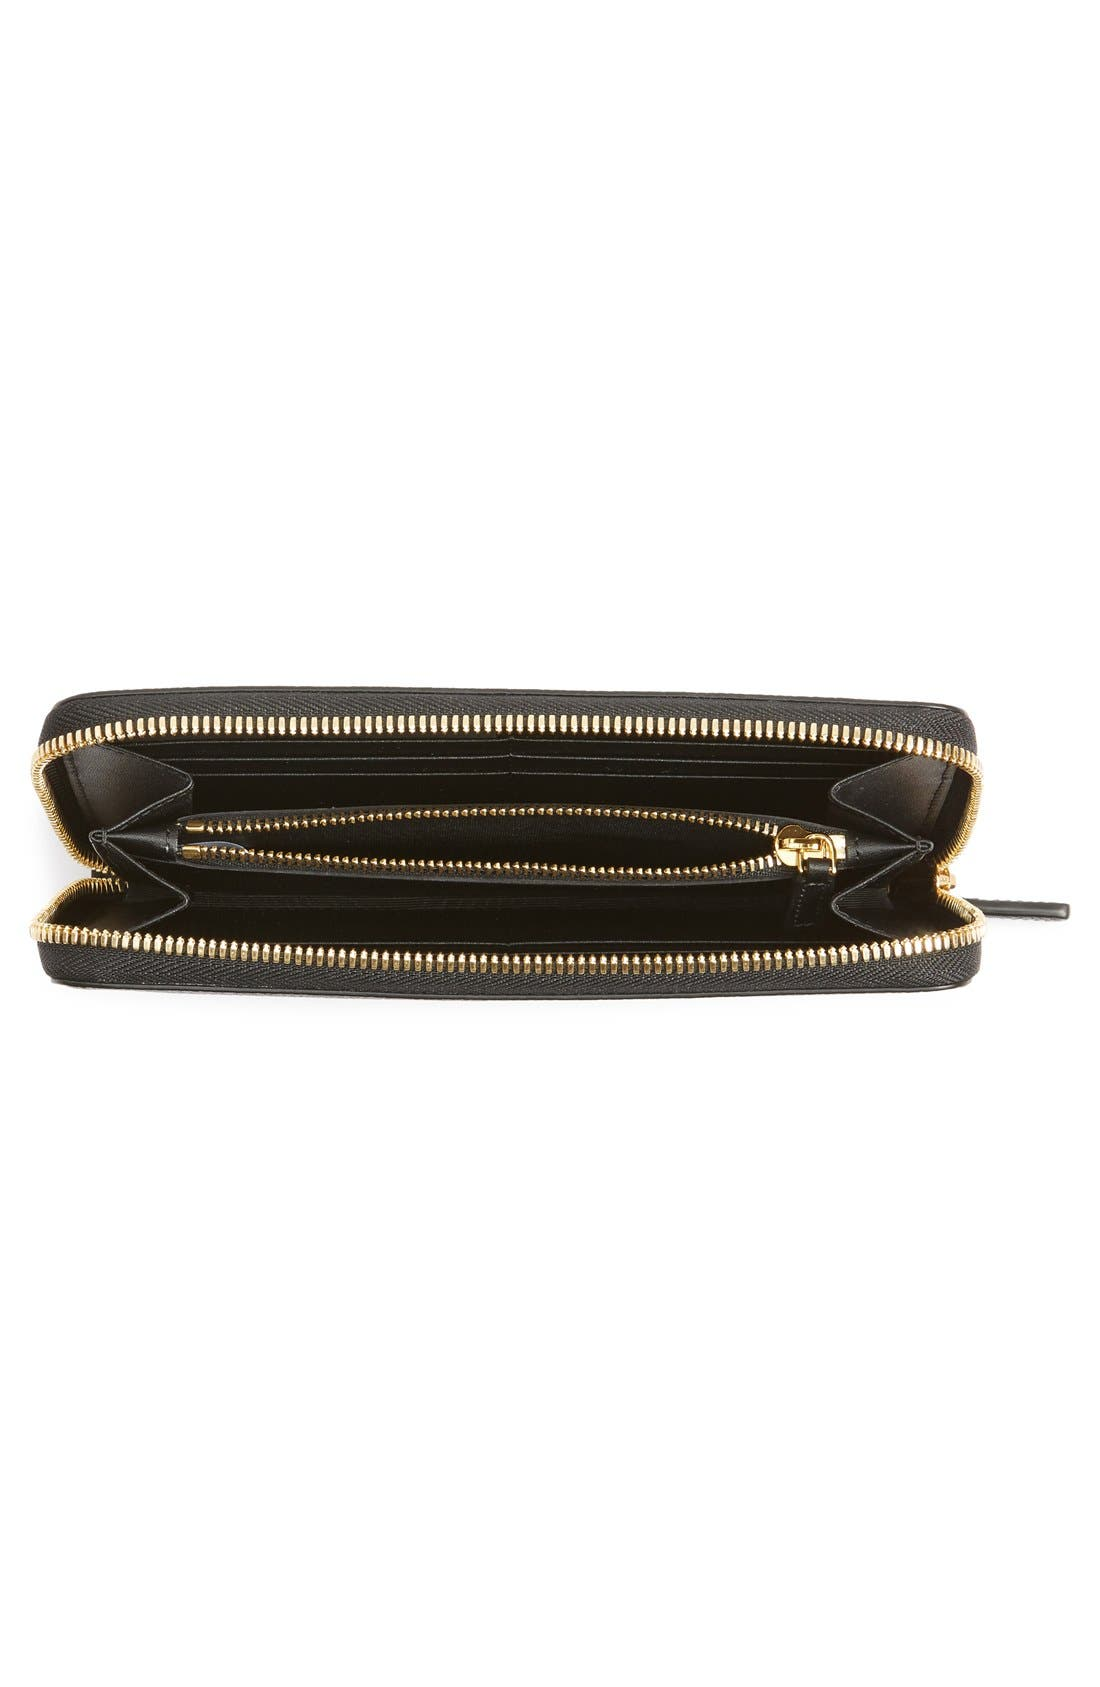 Milla Leather Zip Around Wallet,                             Alternate thumbnail 4, color,                             001